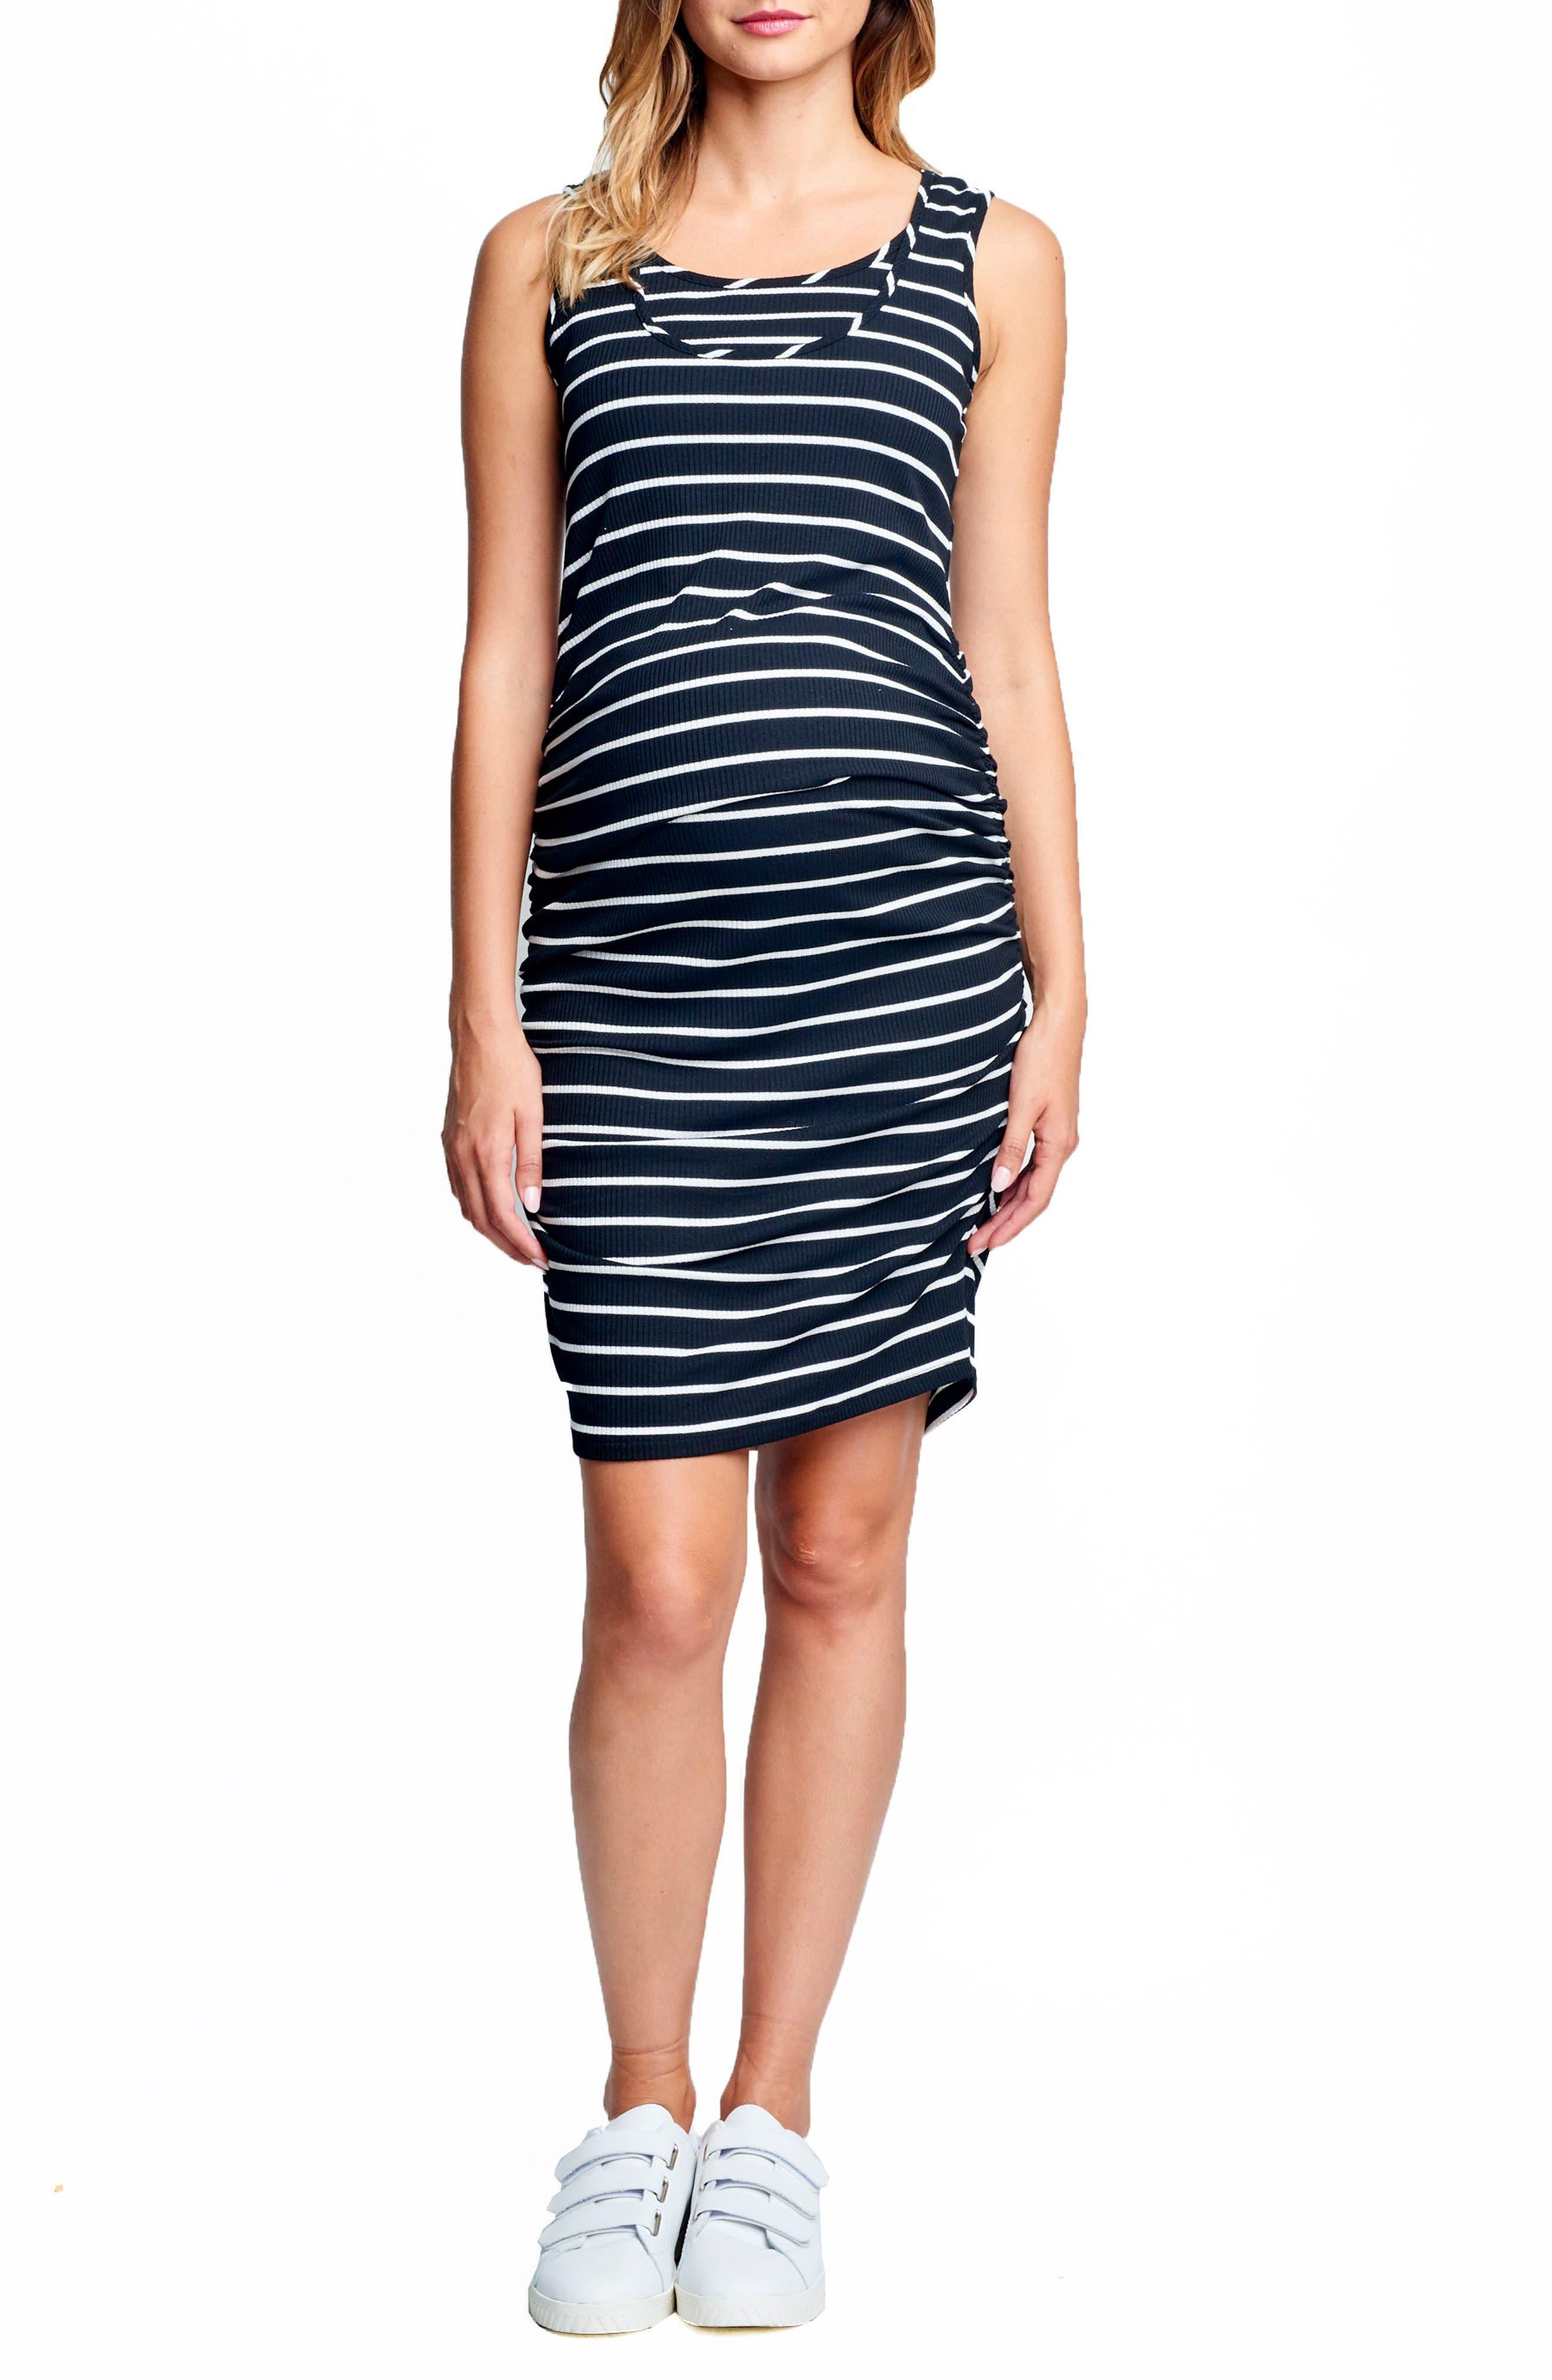 Ruched Maternity/Nursing Dress,                         Main,                         color, BLACK/ WHITE STRIPE